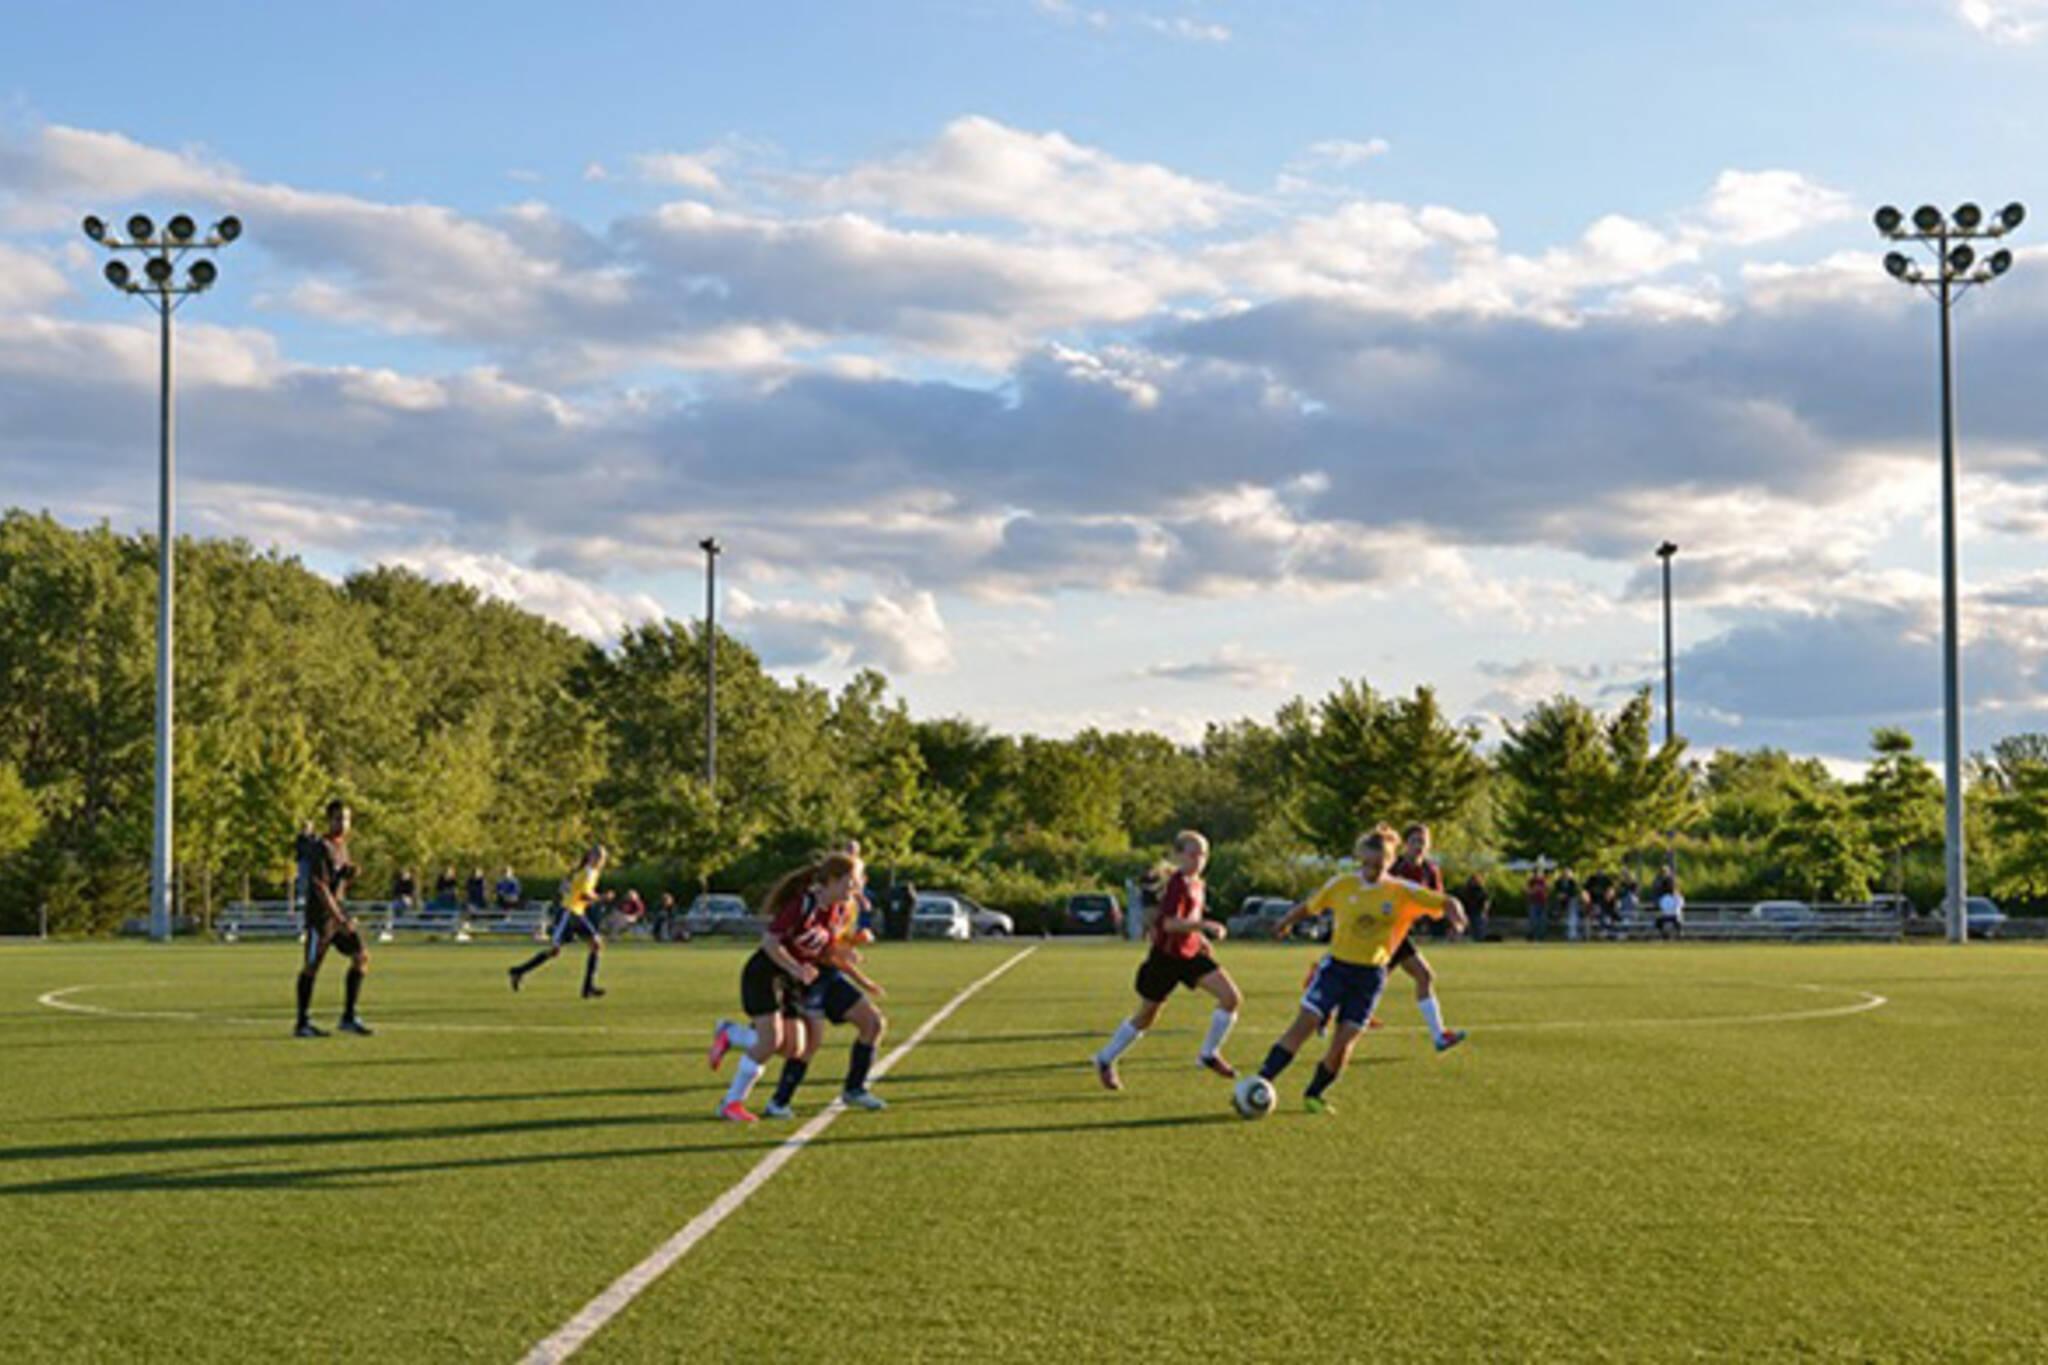 outdoor sports fields toronto